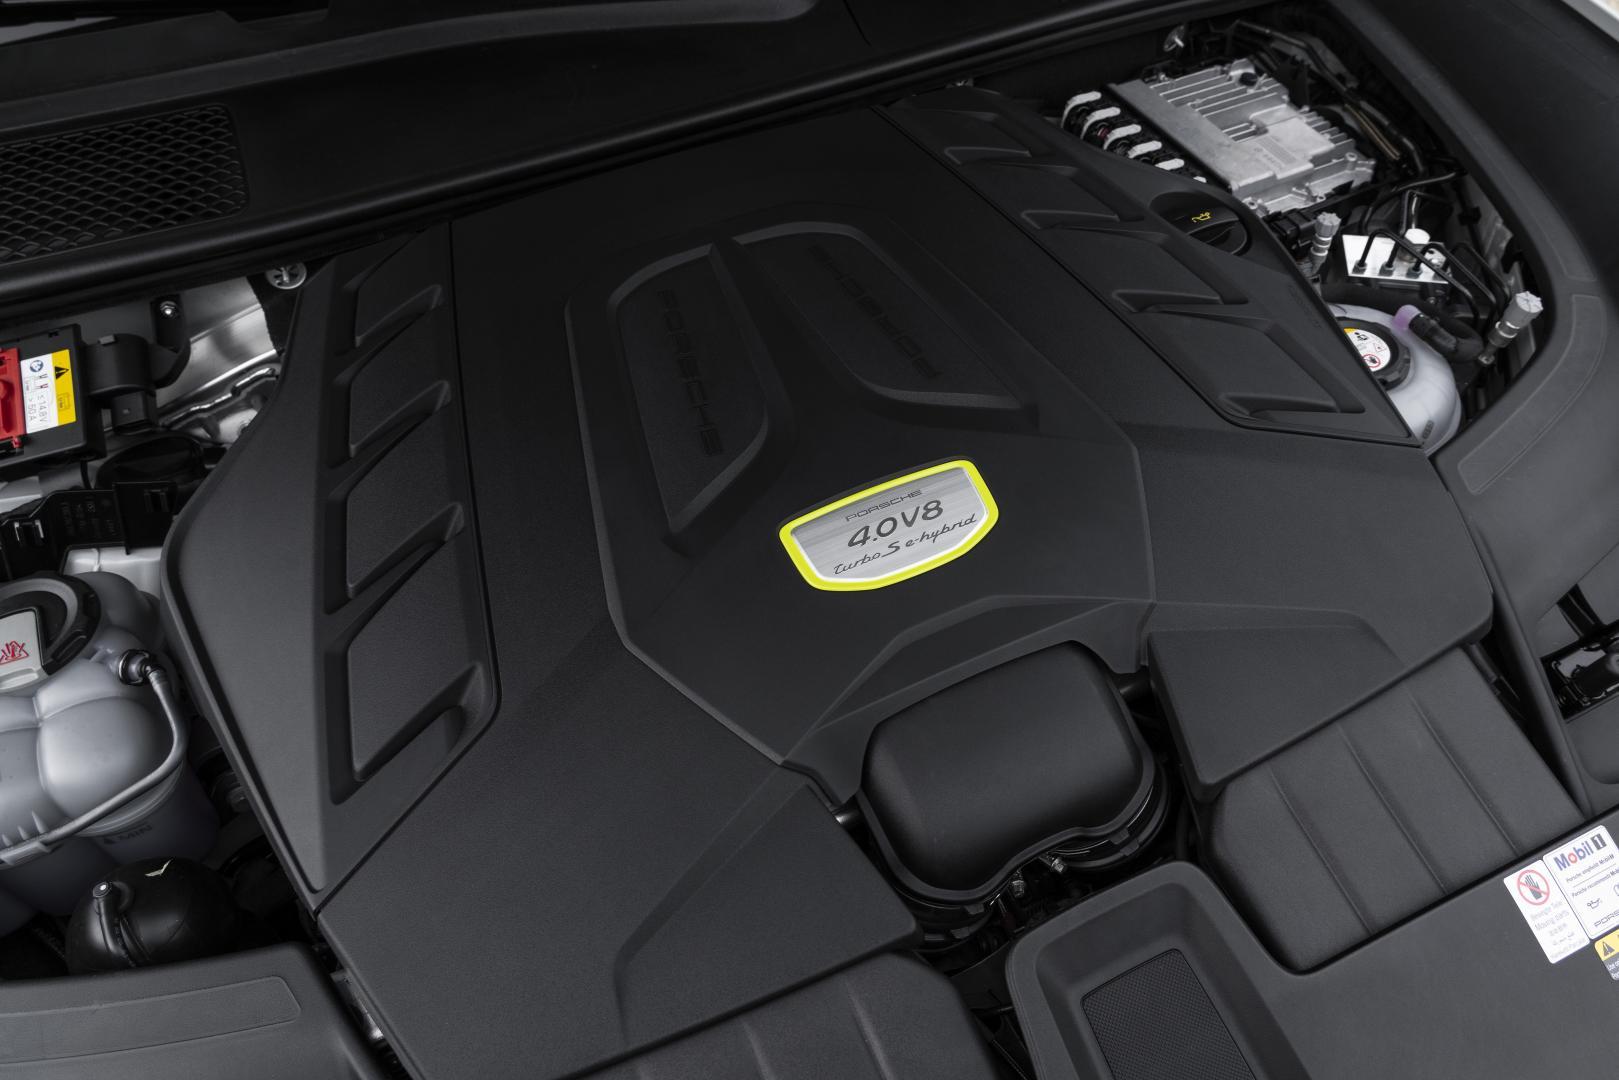 Porsche Cayenne Turbo S E-Hybrid V8